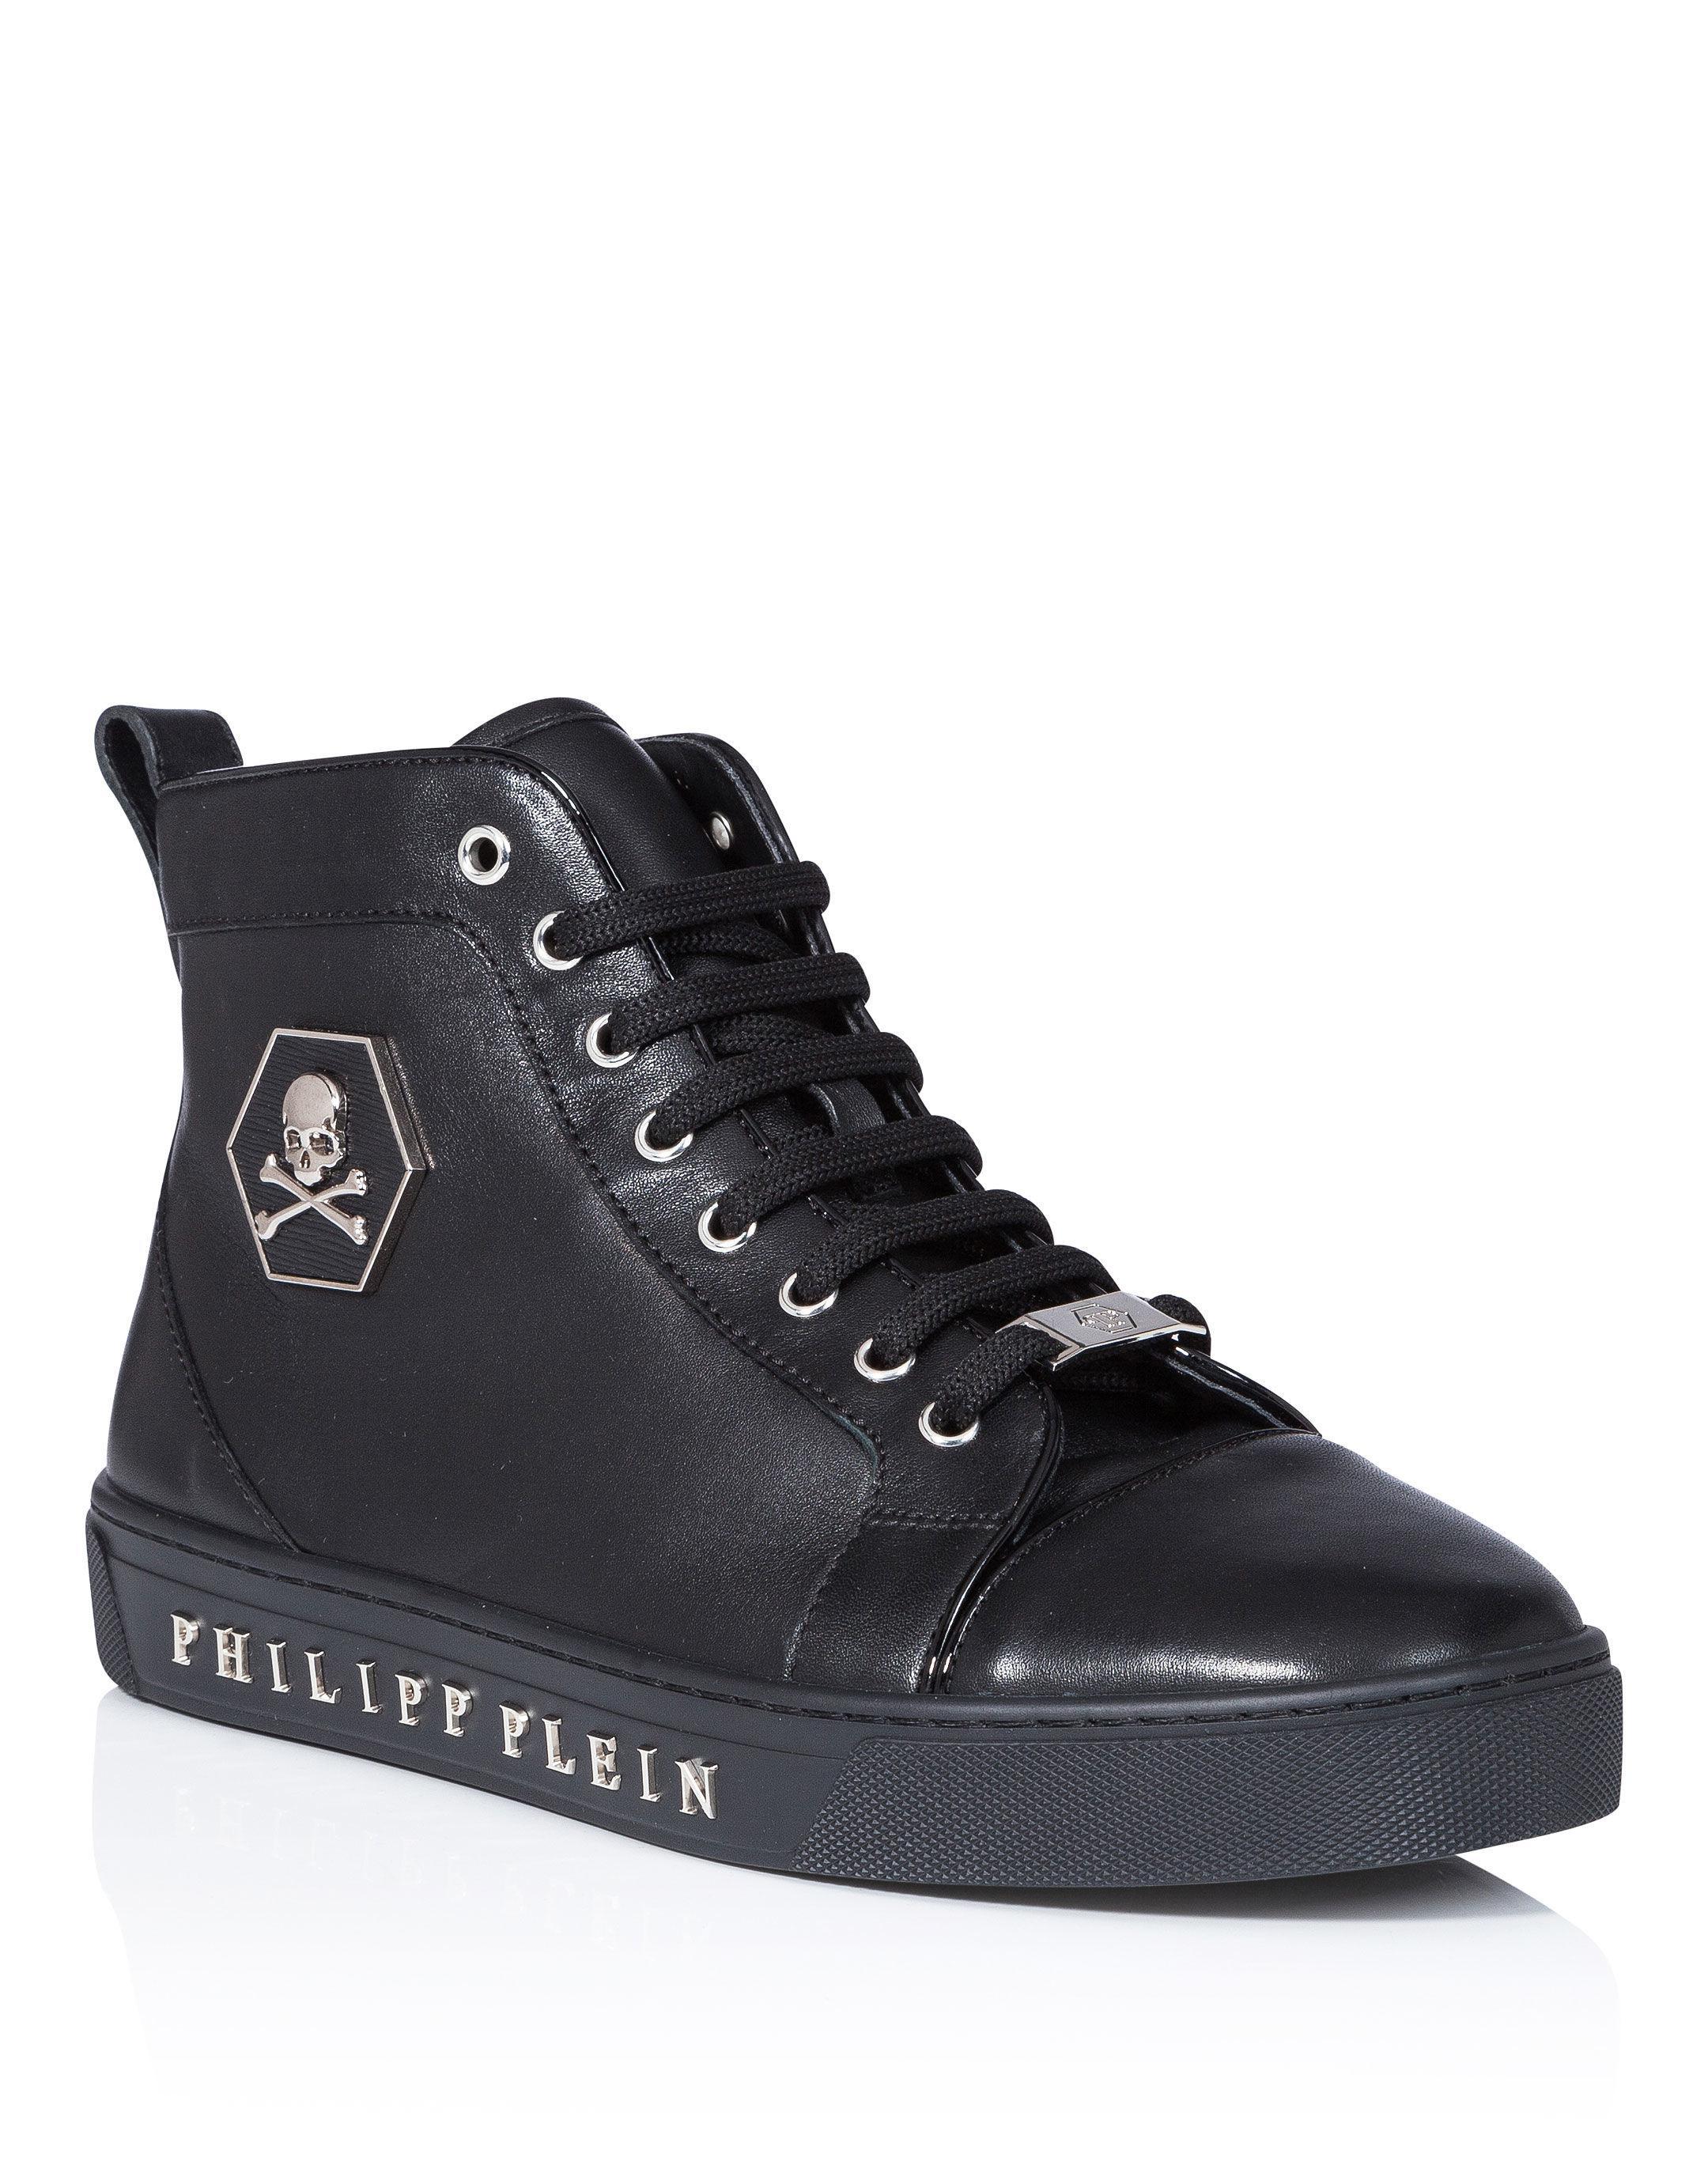 "Philipp Plein Hi-Top Sneakers ""Black one"""